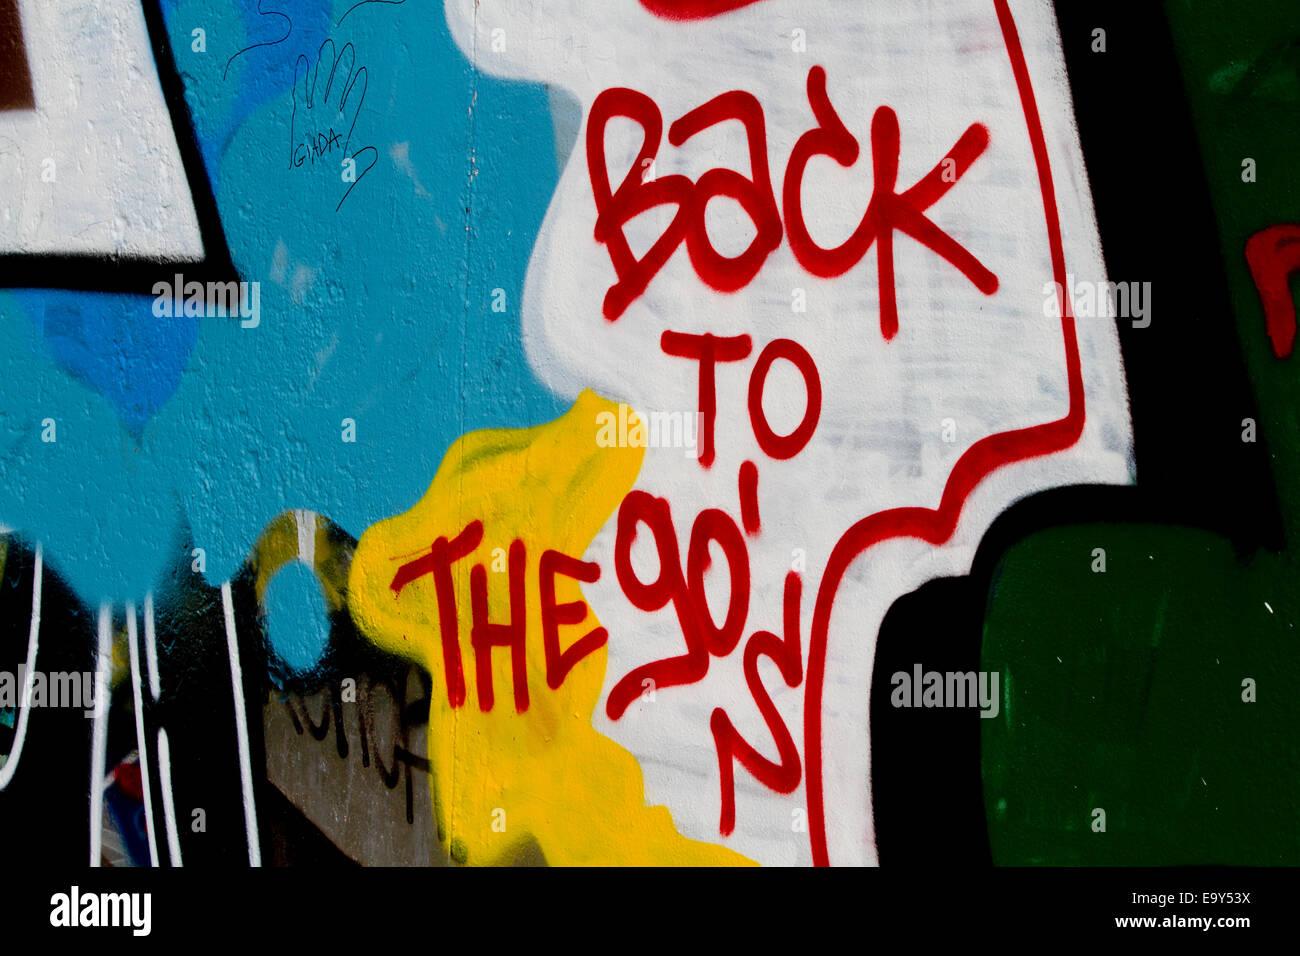 90 S Walls Google Search: Back To The 90s Berlin Wall Graffiti Urban Colour Stock